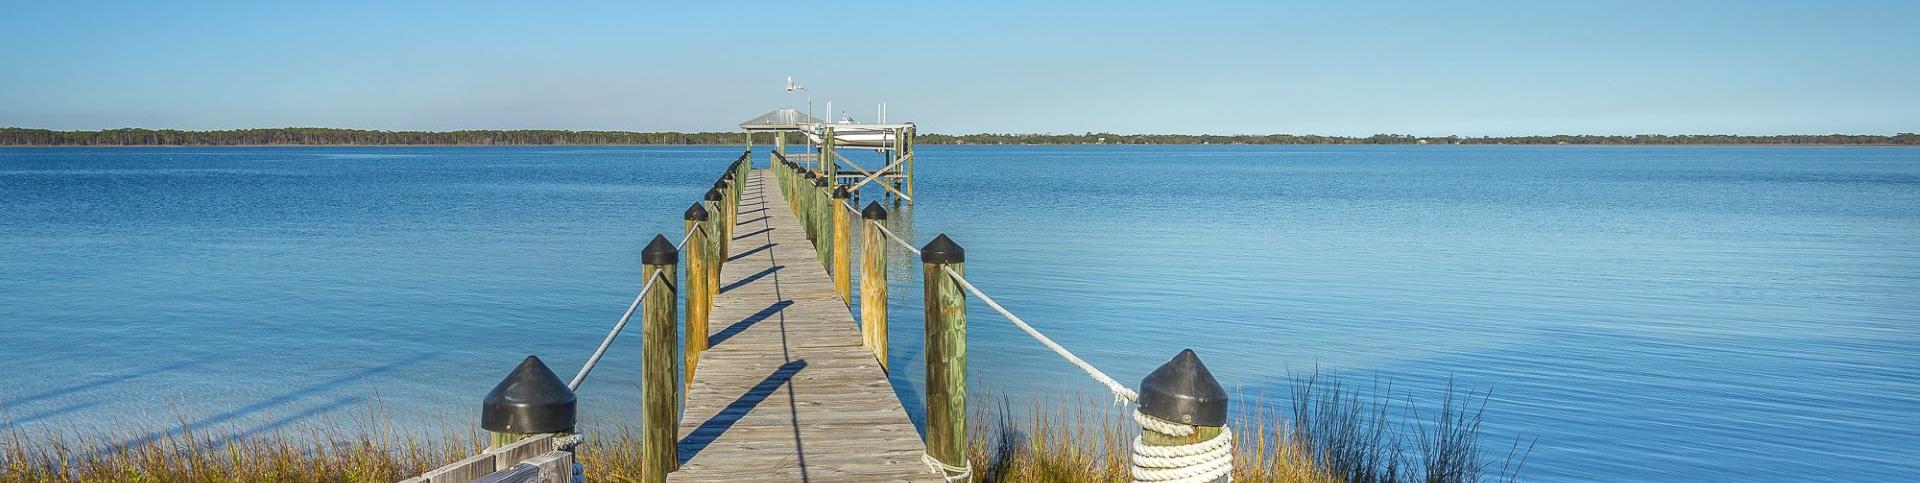 Dock on Alligator Point Florida